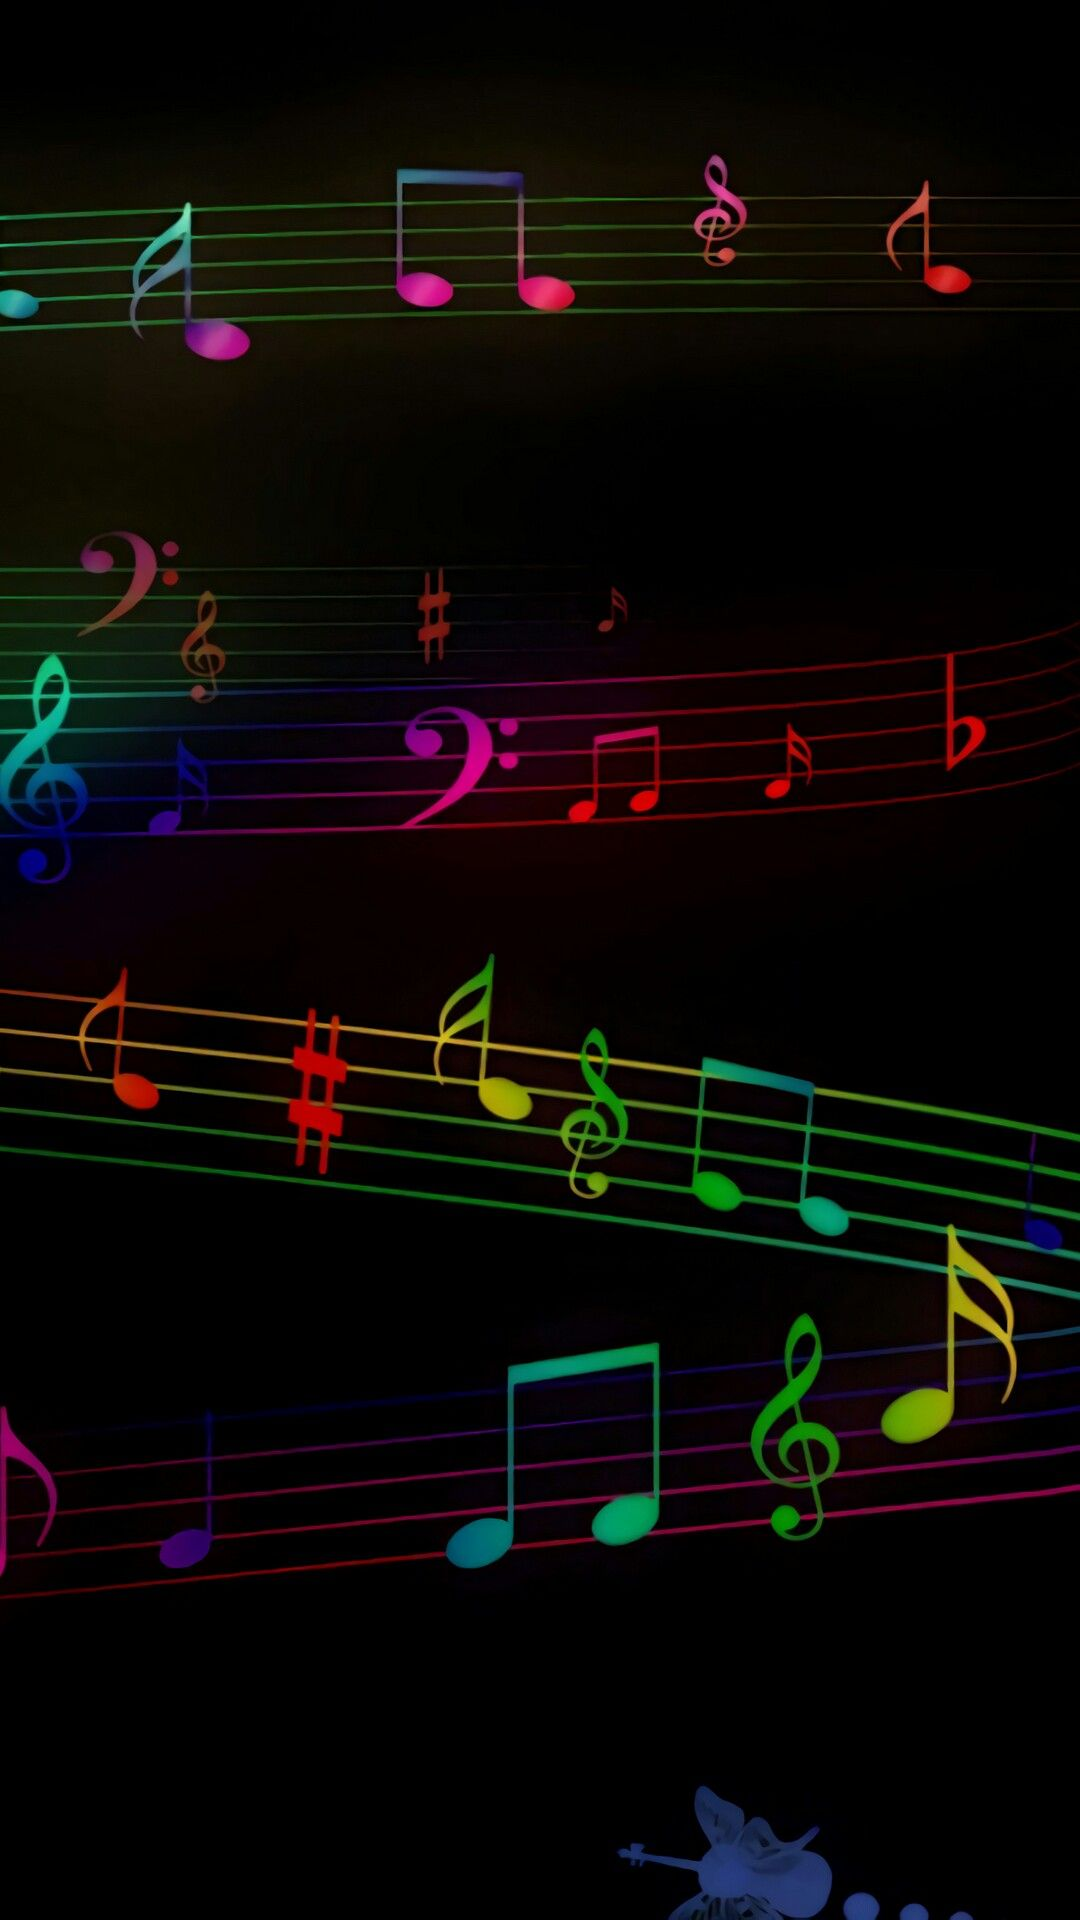 Background Wallpaper Iphone Wallpaper Music Musical Wallpaper Music Notes Wallpaper